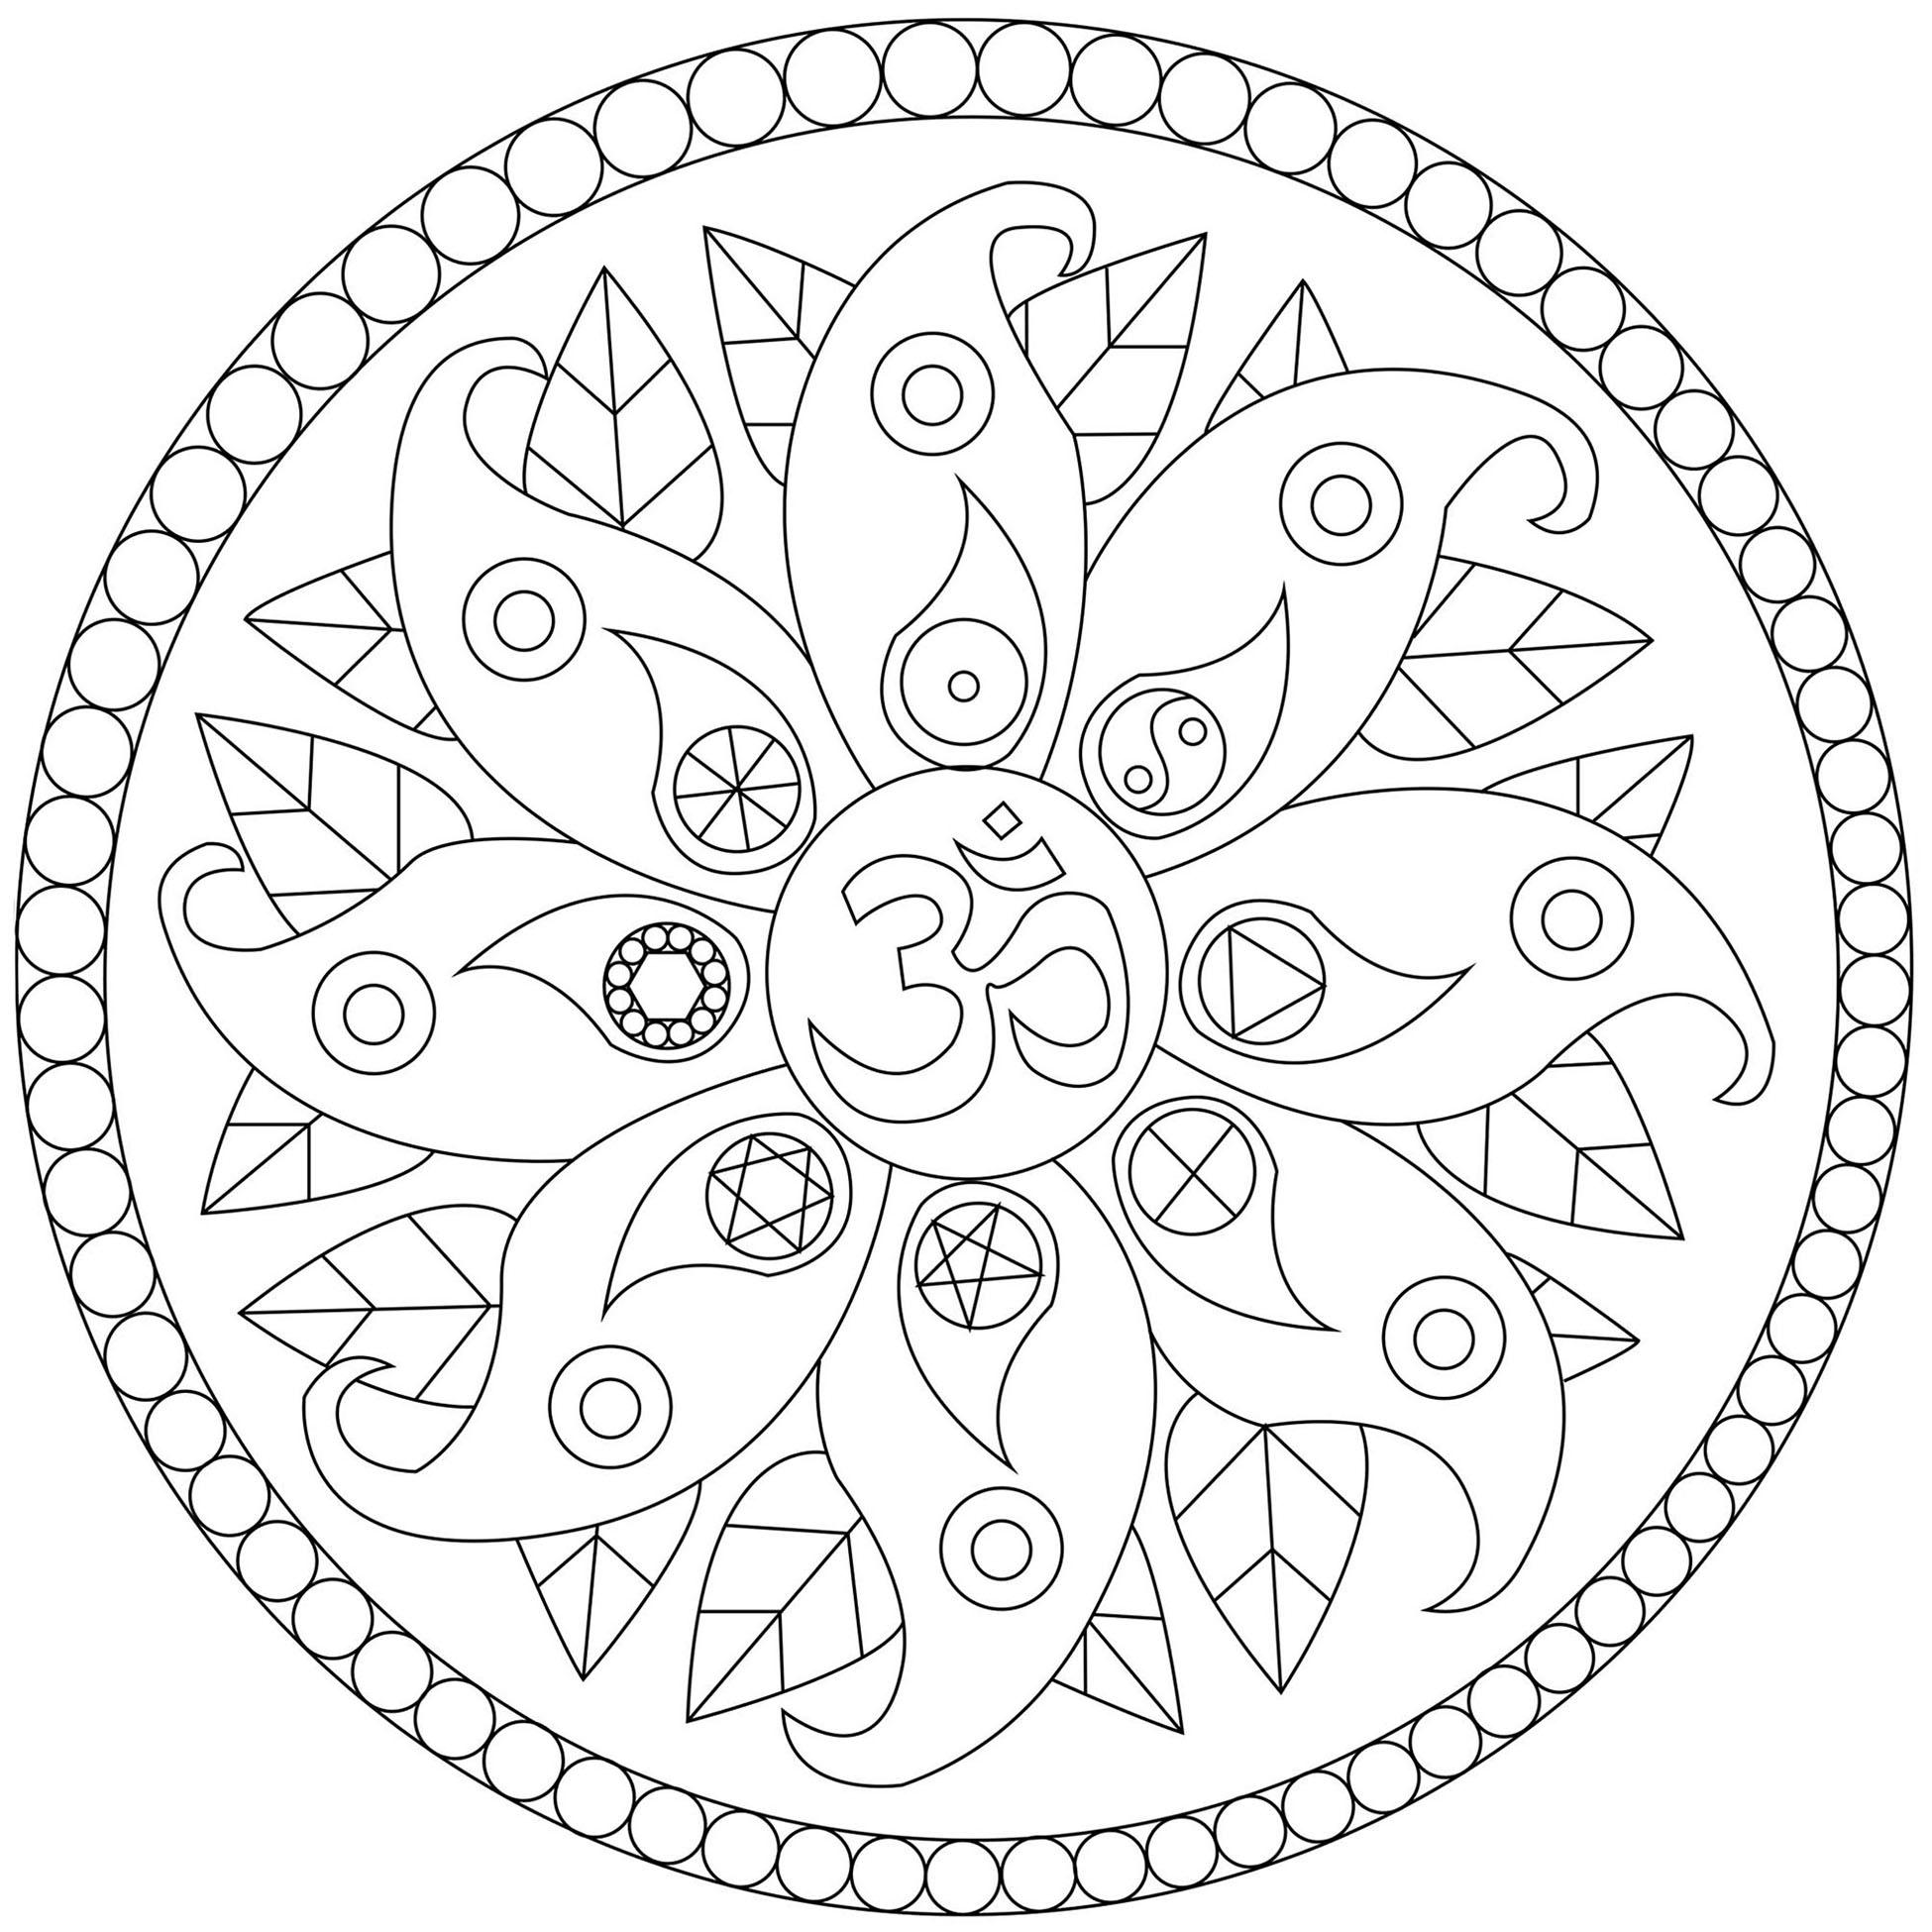 Joli Mandala avec divers symboles comme le Yin et le Yang, le symbole Om ...